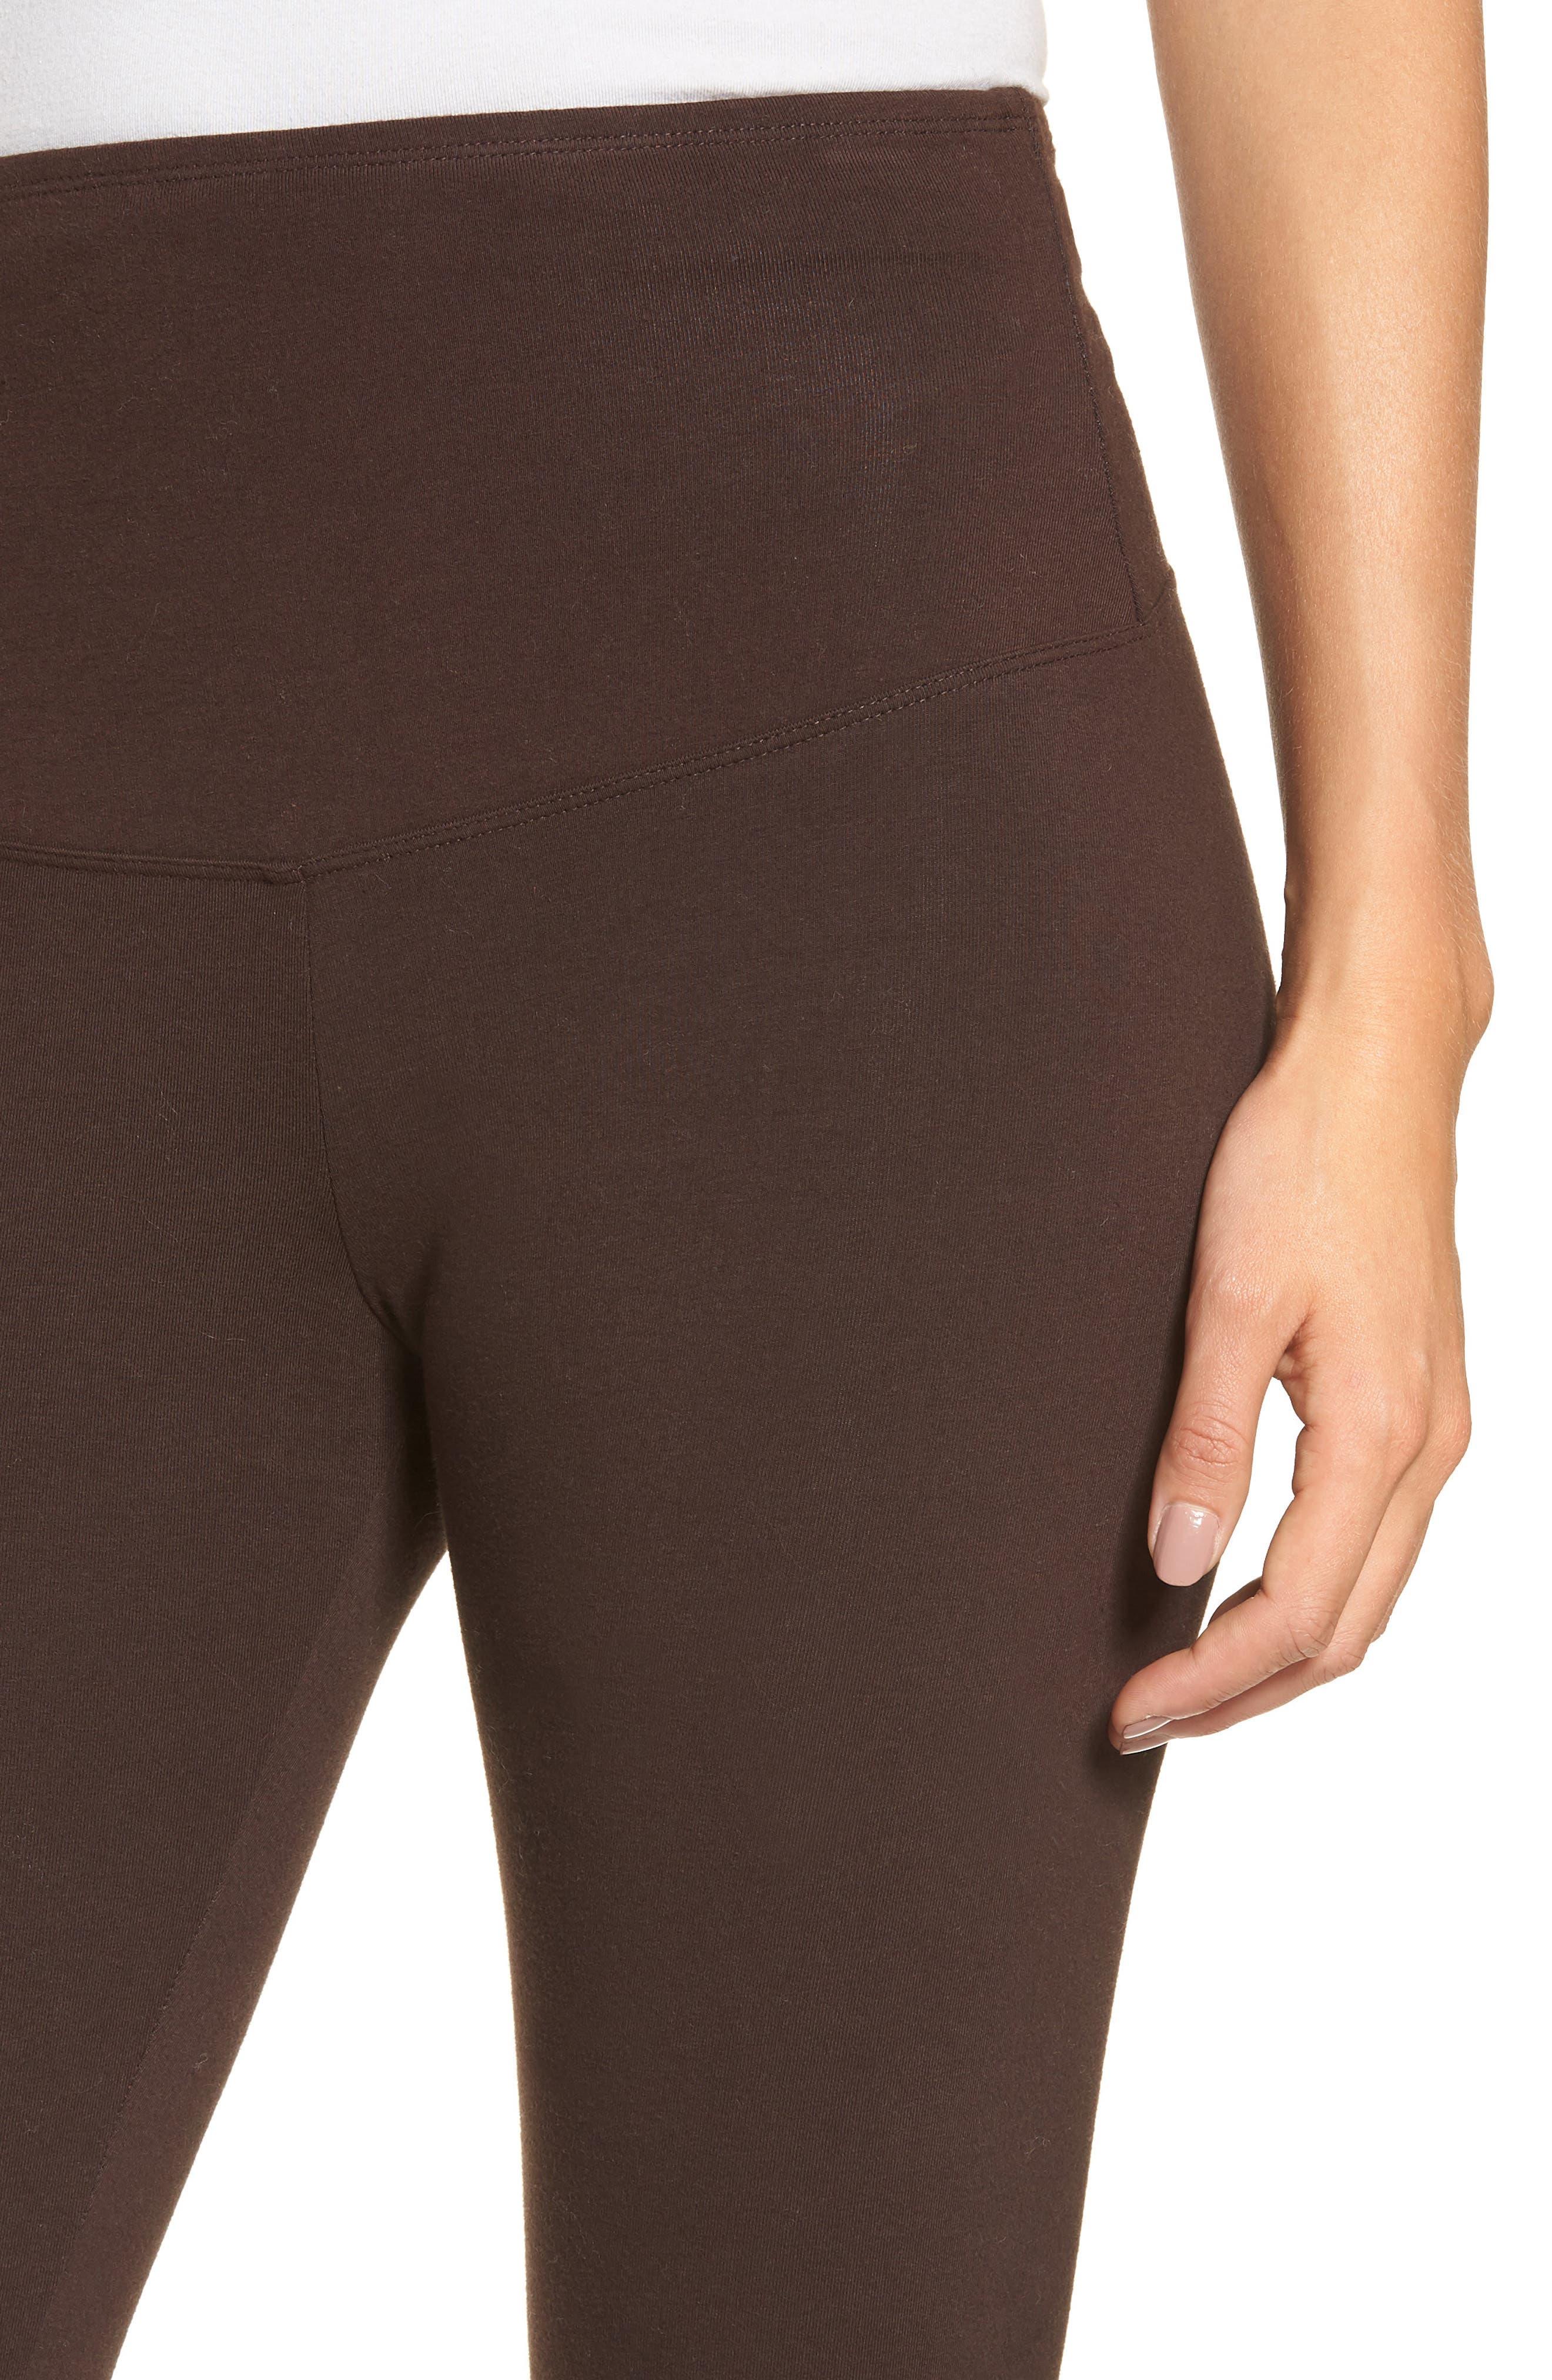 'Rachel' High Waist Leggings,                             Alternate thumbnail 4, color,                             CHOCOLATE TORTE